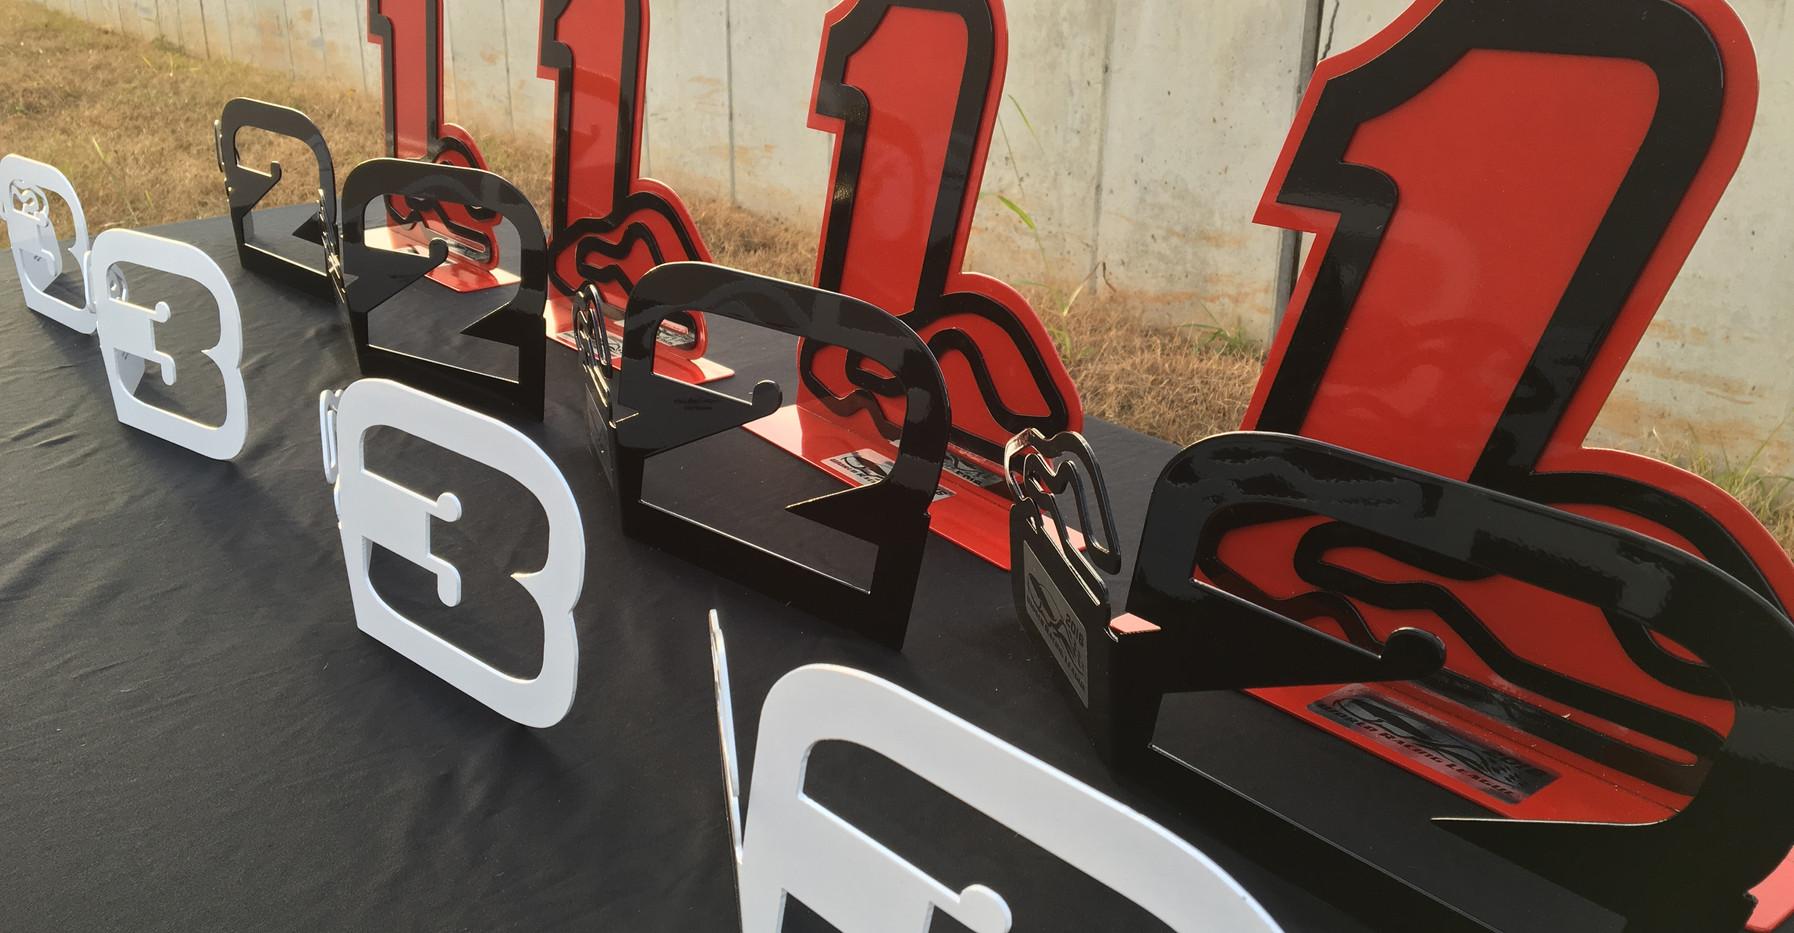 WRL Podium Trophies on display at NCM